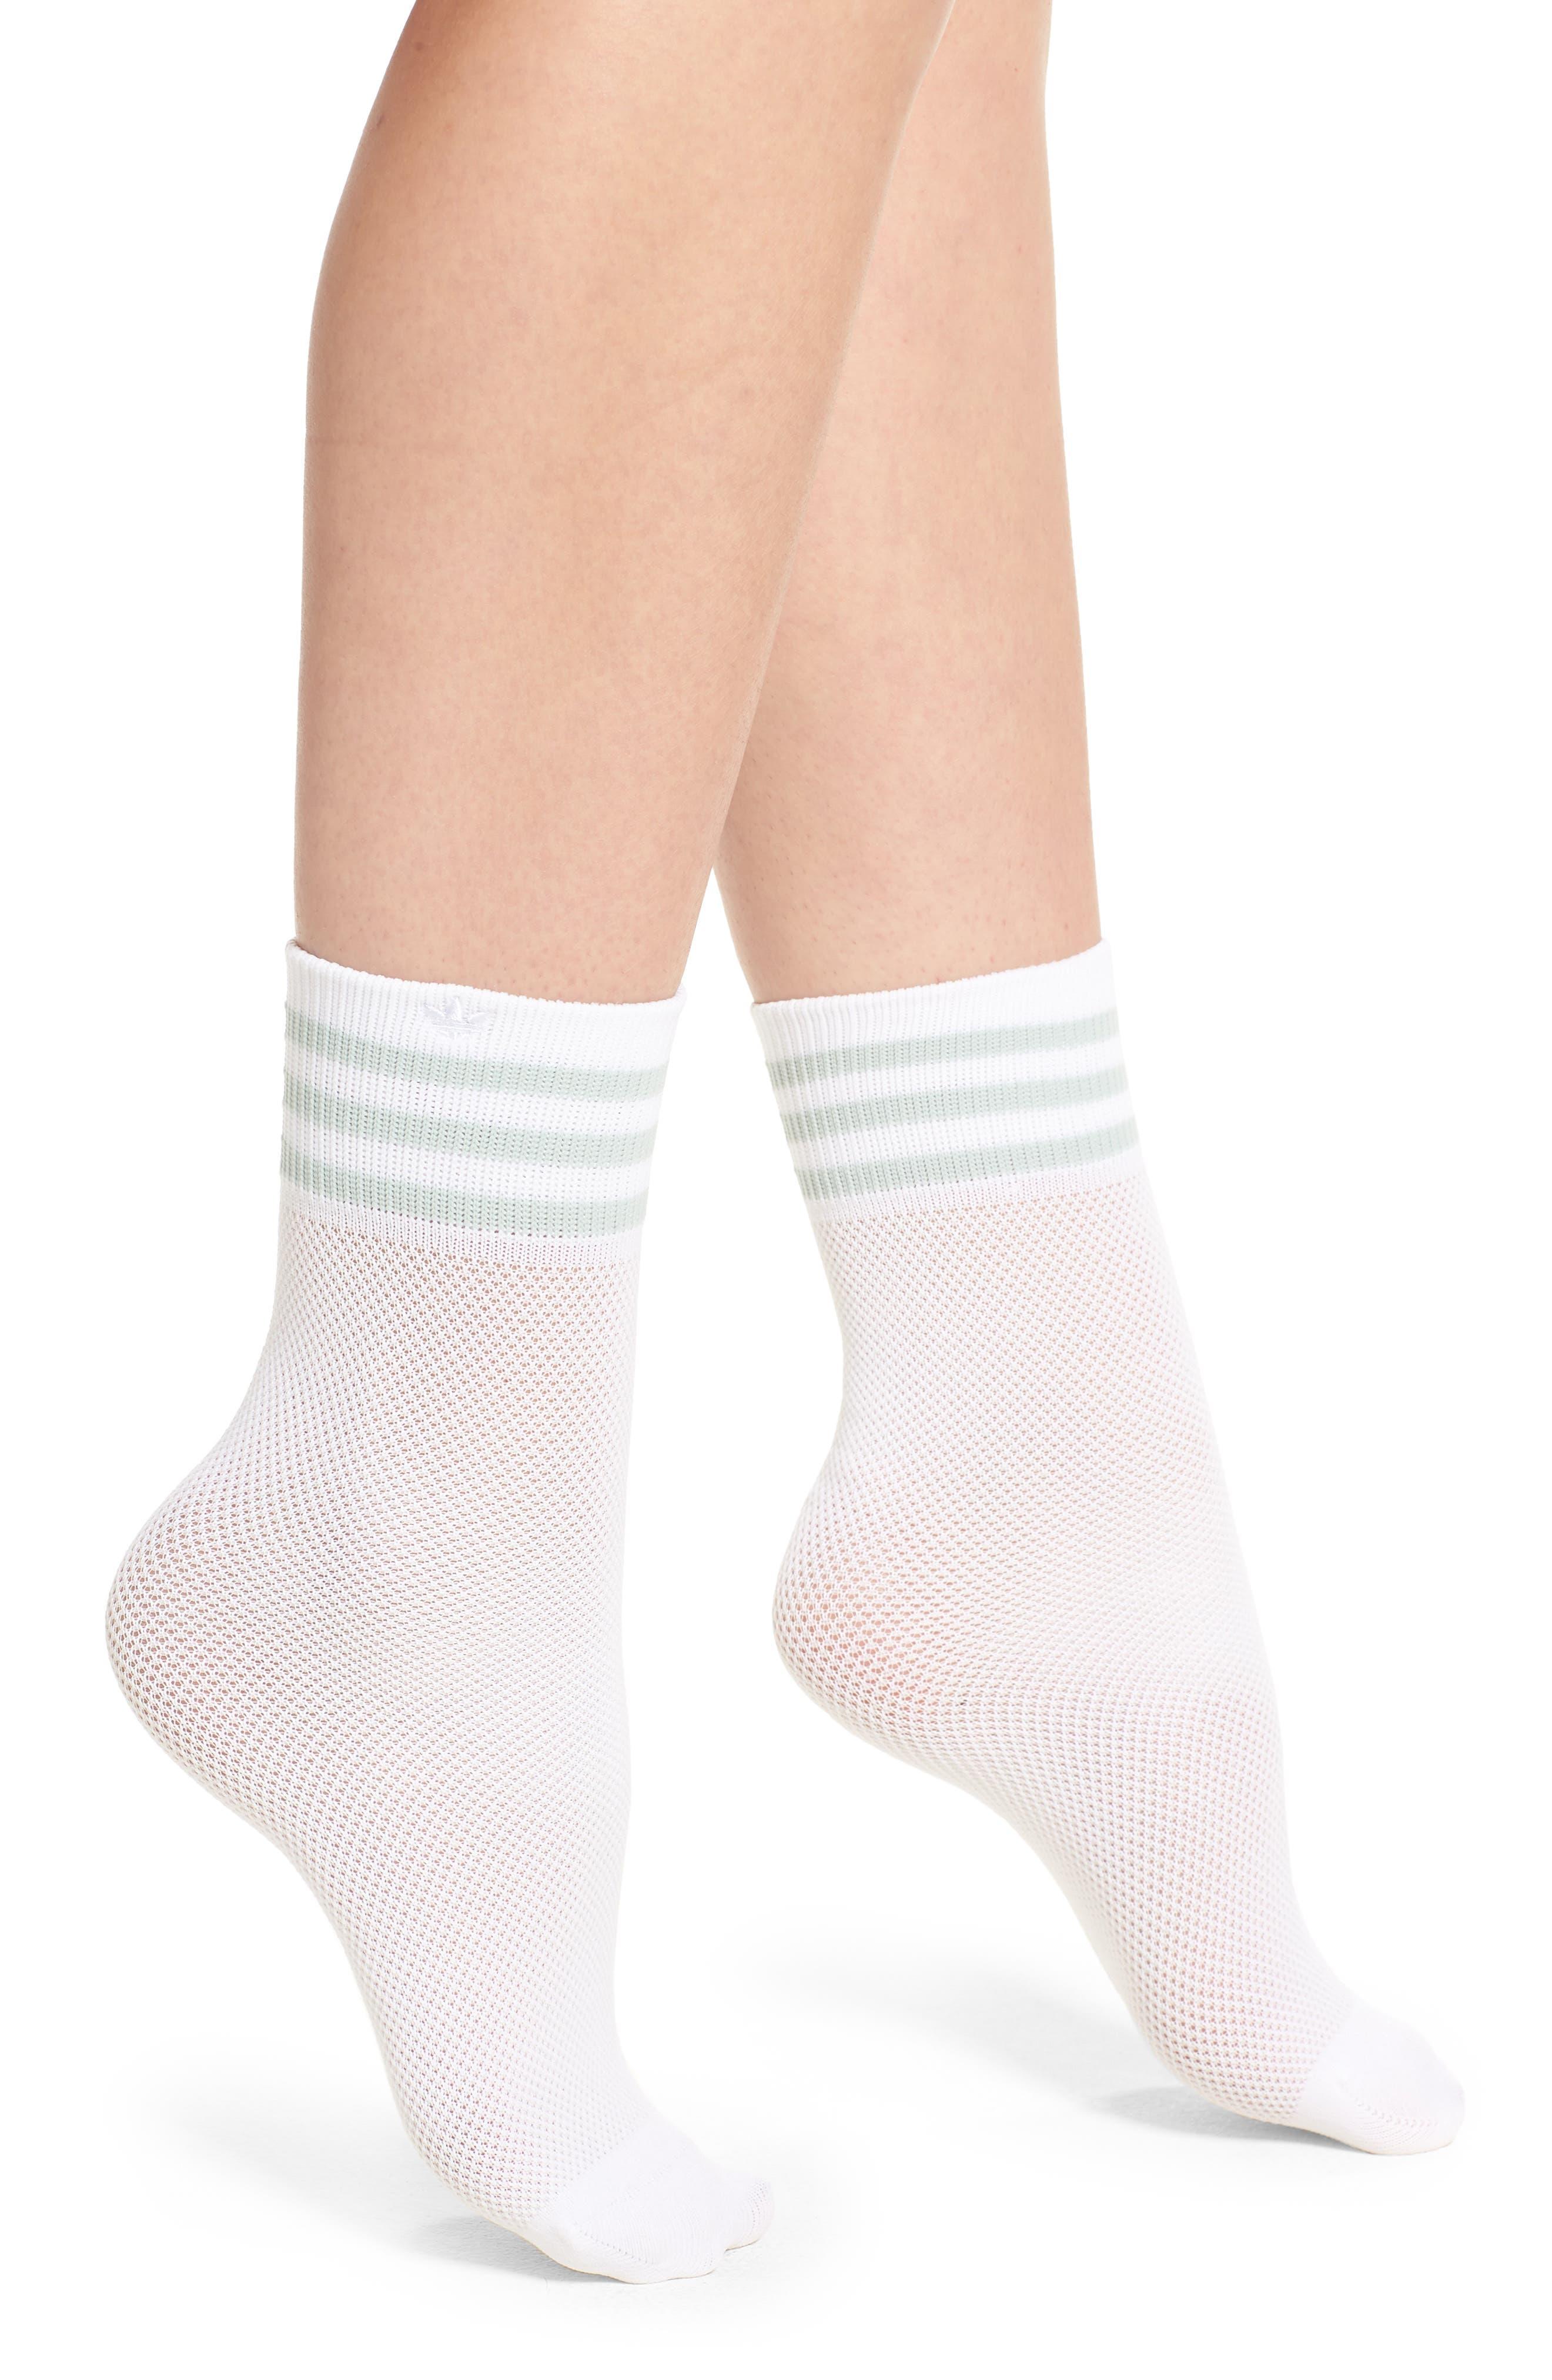 ADIDAS Stripe Mesh Ankle Socks, Main, color, 100